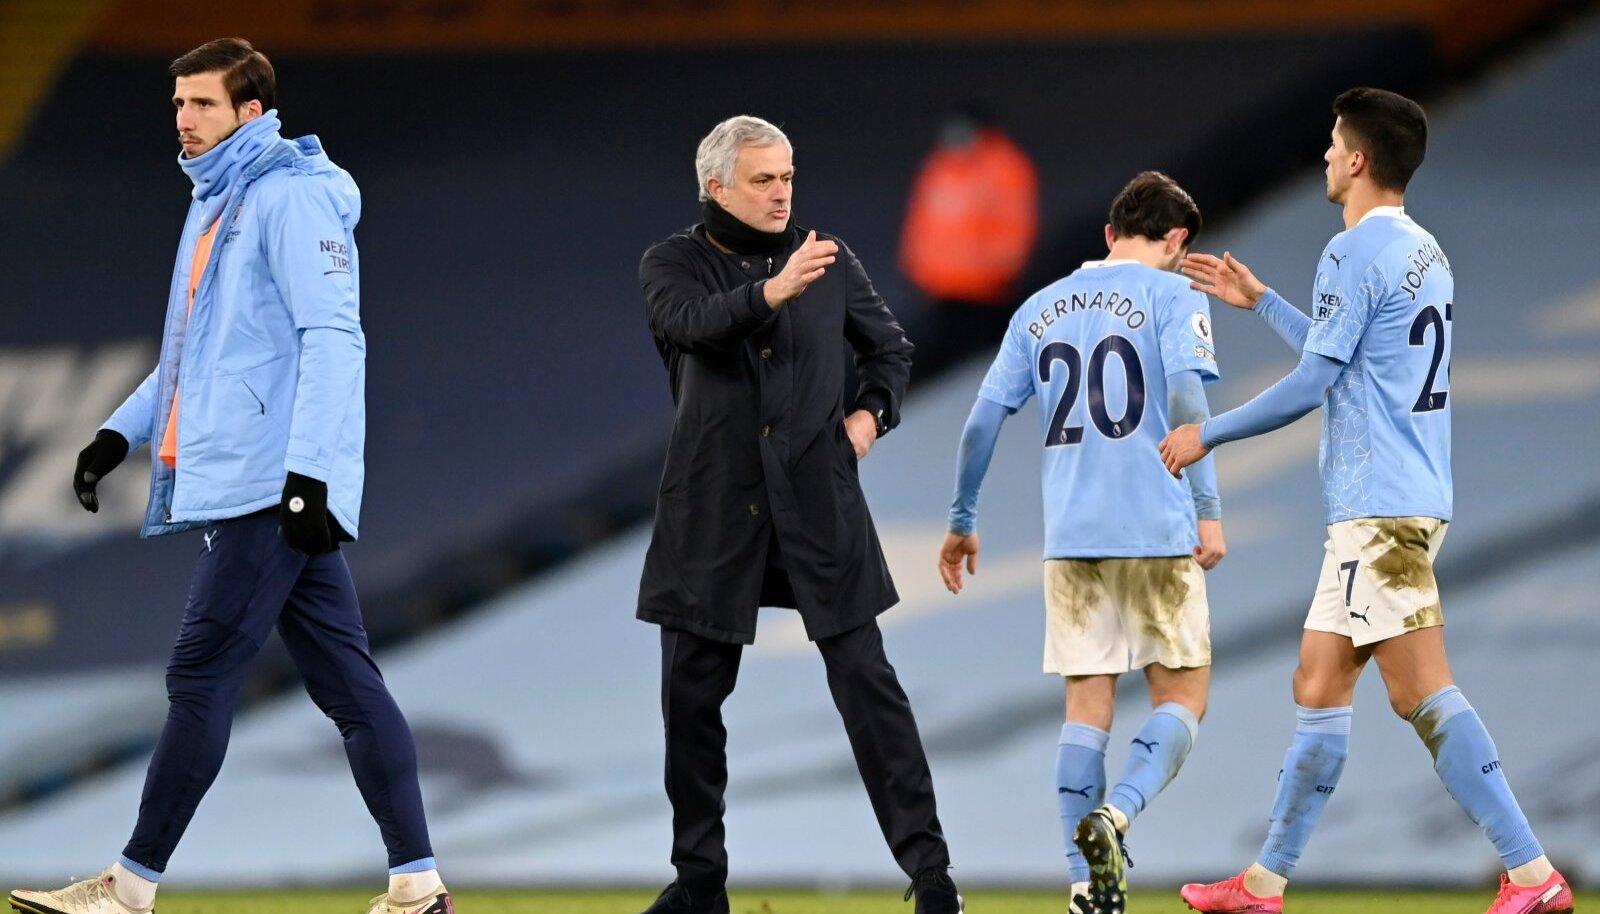 Manchester City portugallastest mängumehed Ruben Dias (vasakul), Bernardo Silva (seljaga ) ja Joao Cancelo tervitamas Tottenhami portugallasest peatreenerit Jose Mourinhot.